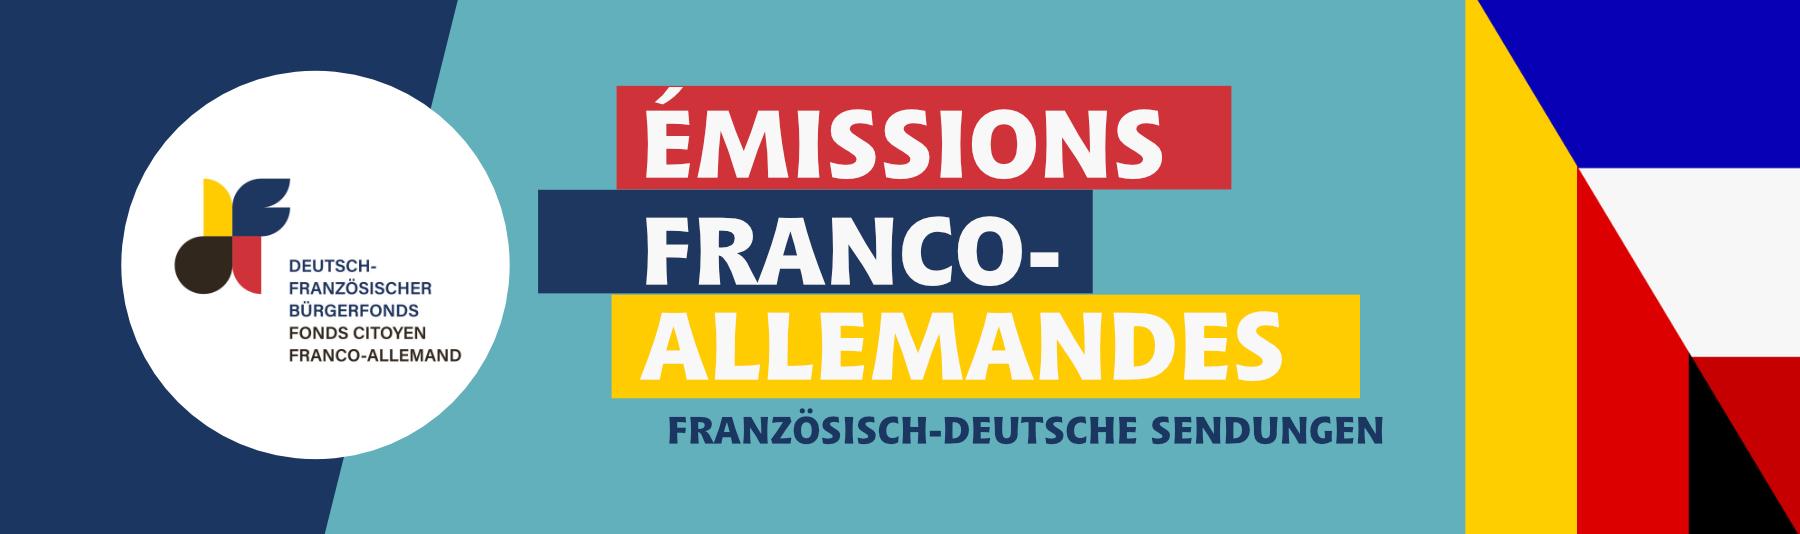 JOURNEE FRANCO-ALLEMANDE